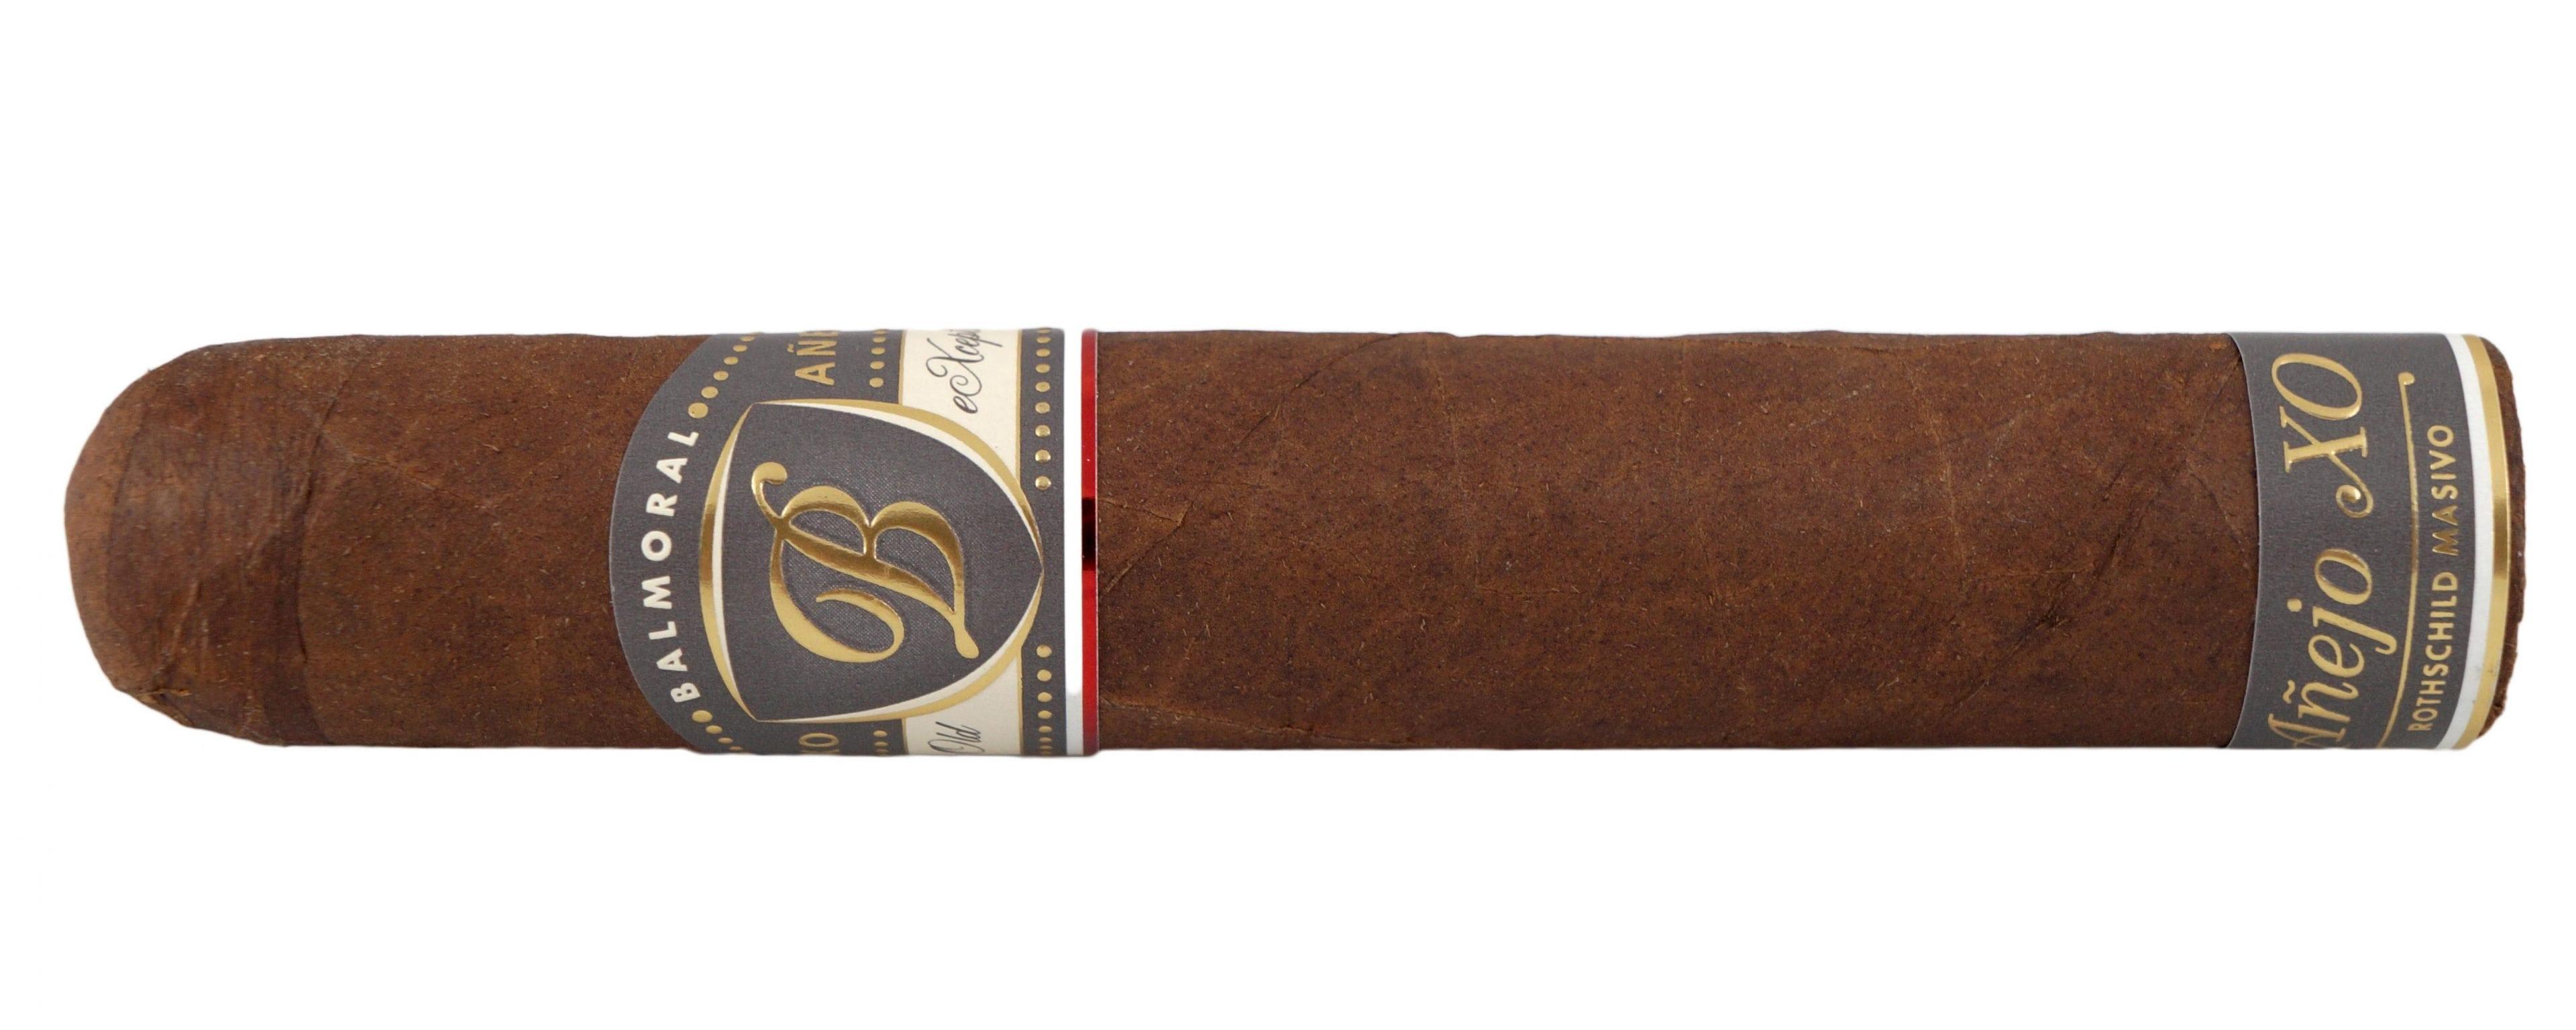 Blind Cigar Review: Balmoral | Anejo XO Rothschild Masivo